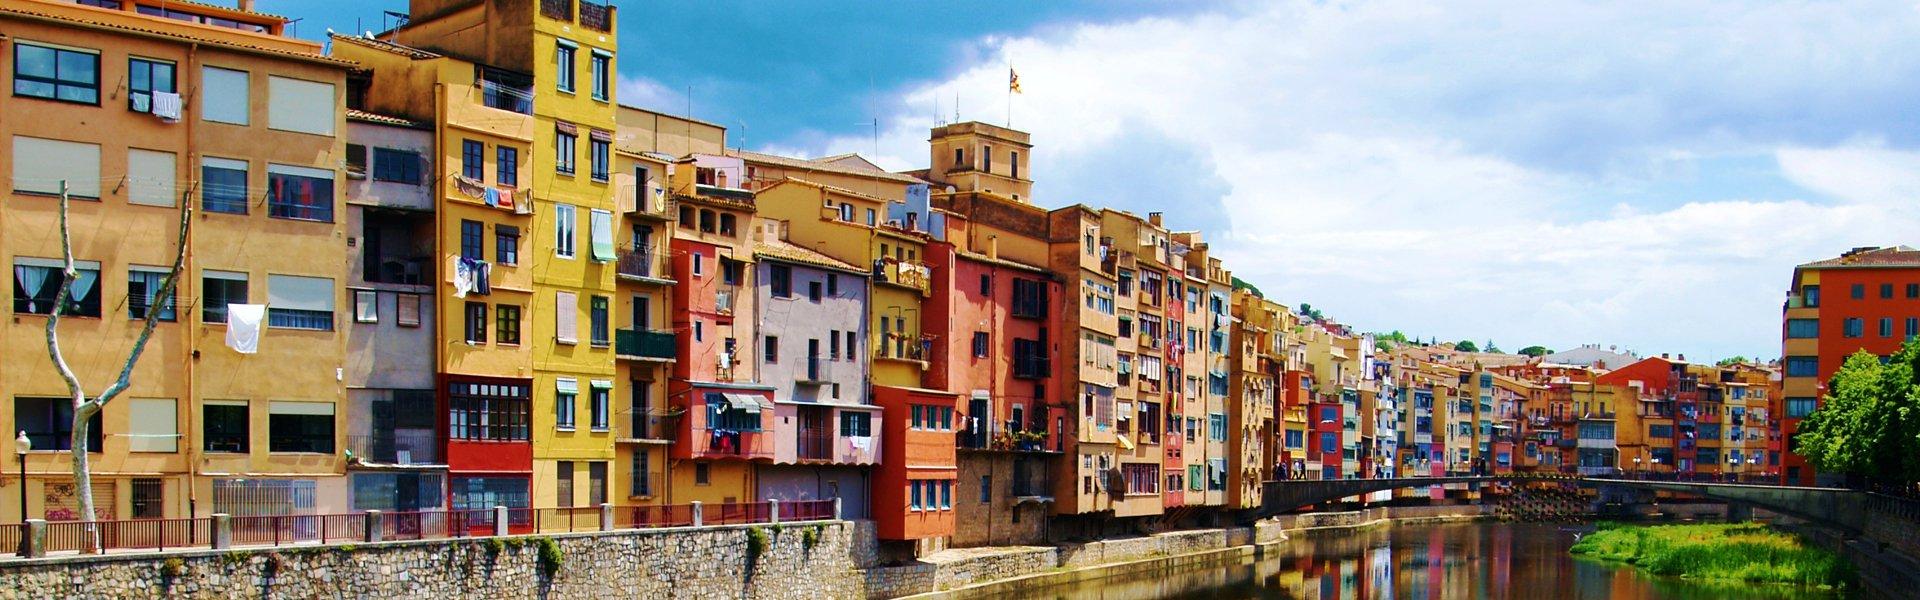 Girona, Spanje